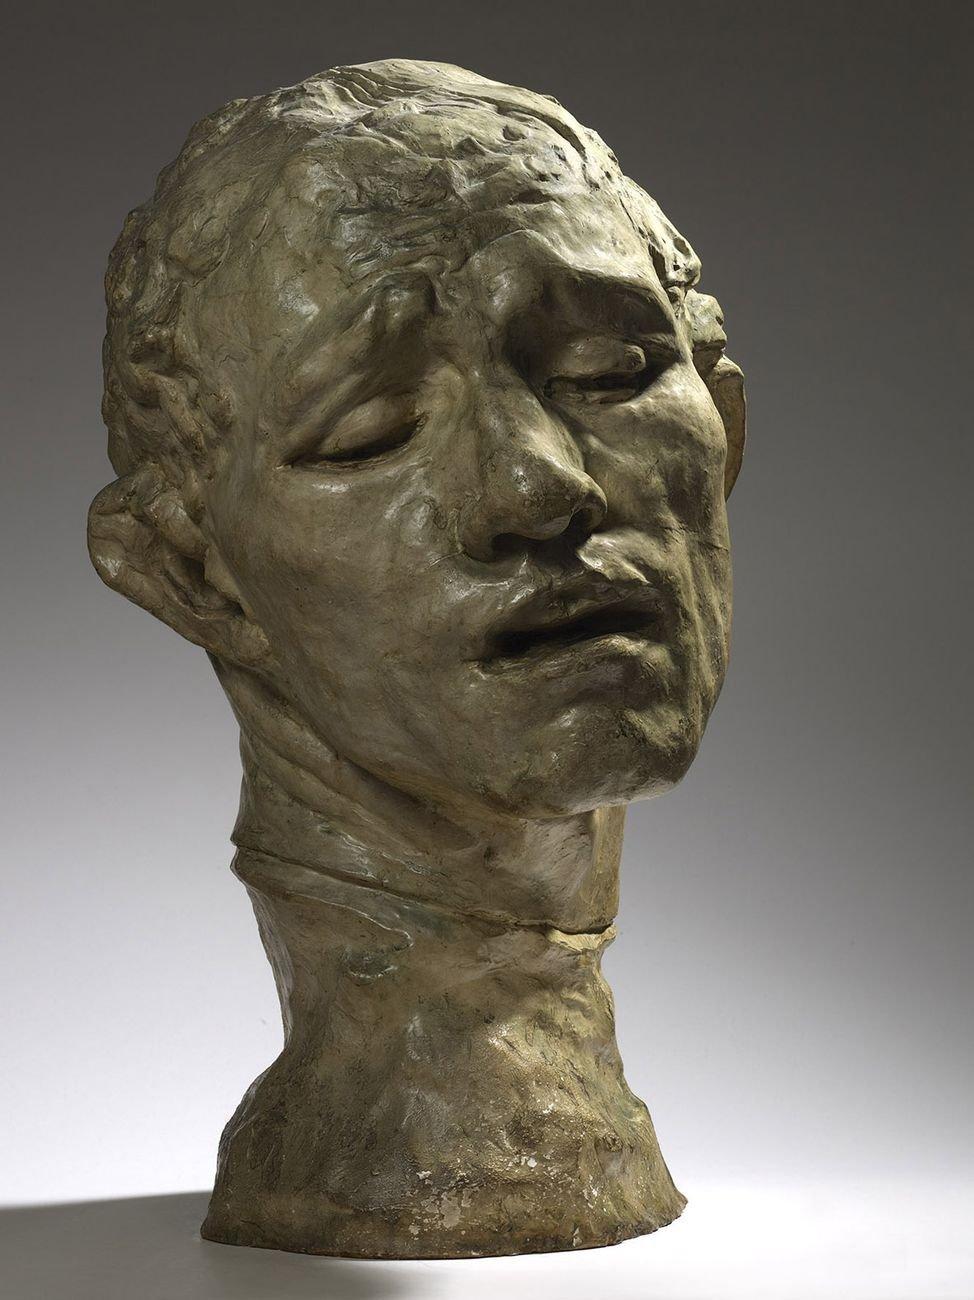 Auguste Rodin, Testa monumentale di Pierre de Wissant (I borghesi di Calais), 1909. Parigi, musée Rodin © Musée Rodin, photo Christian Baraja